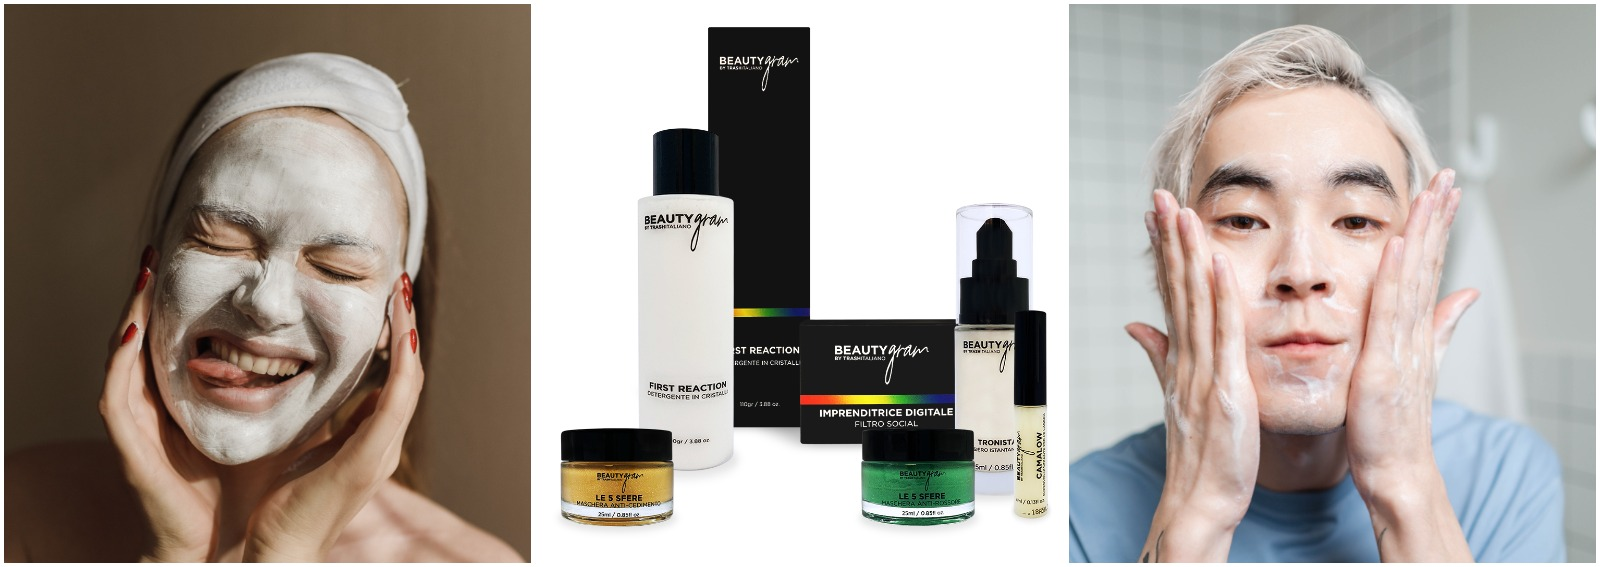 beautygram by trash italiano linea beauty skincare creme maschere cover desktop